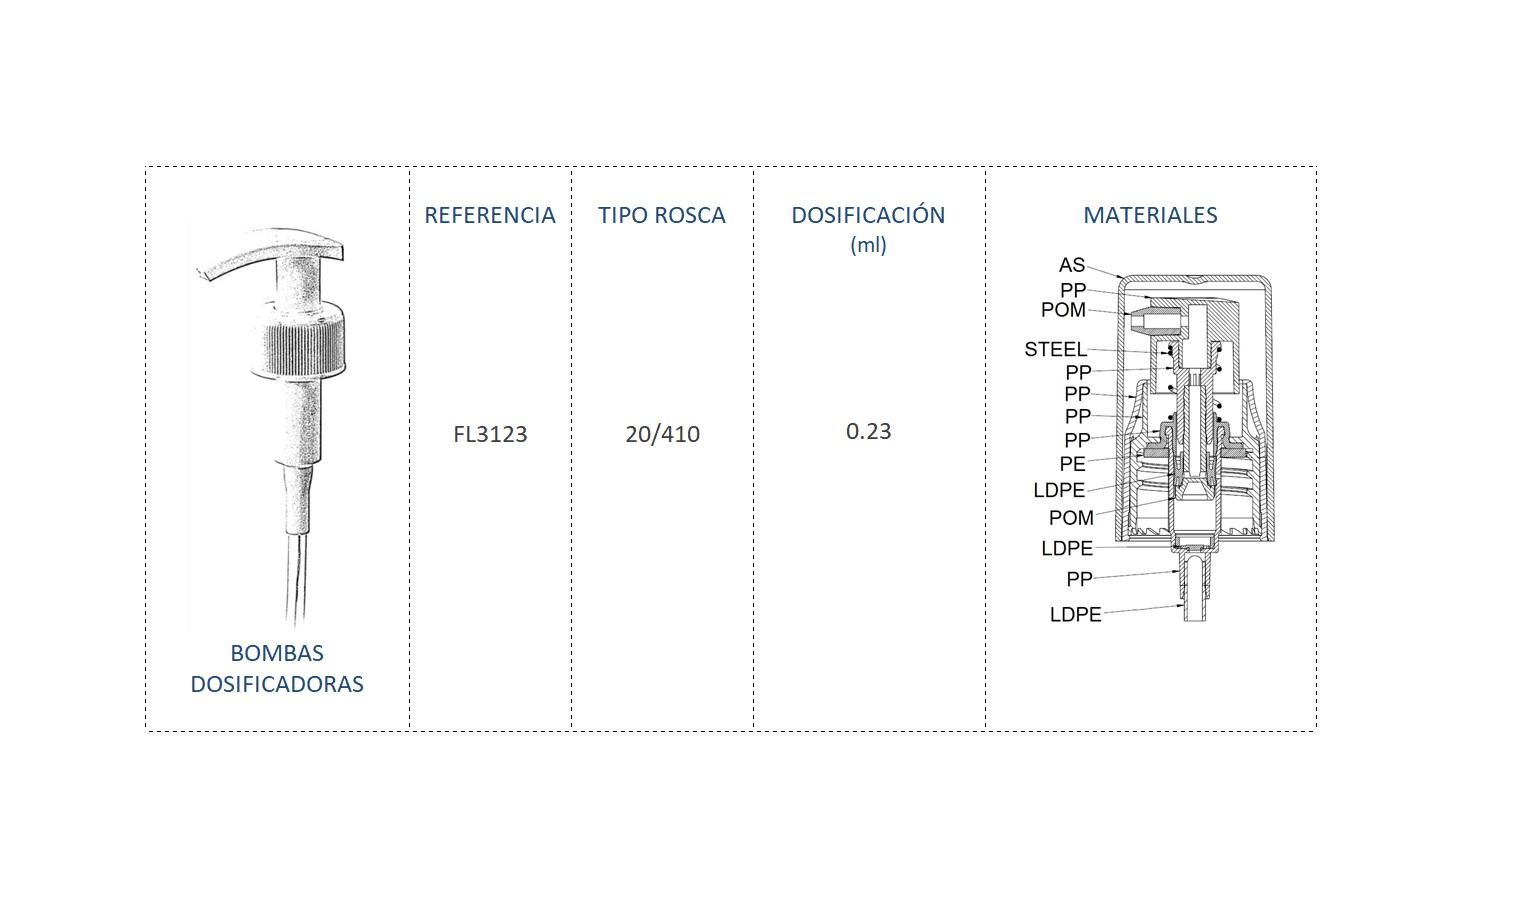 Cuadro de materiales bomba dosificadora FL3123 20/410